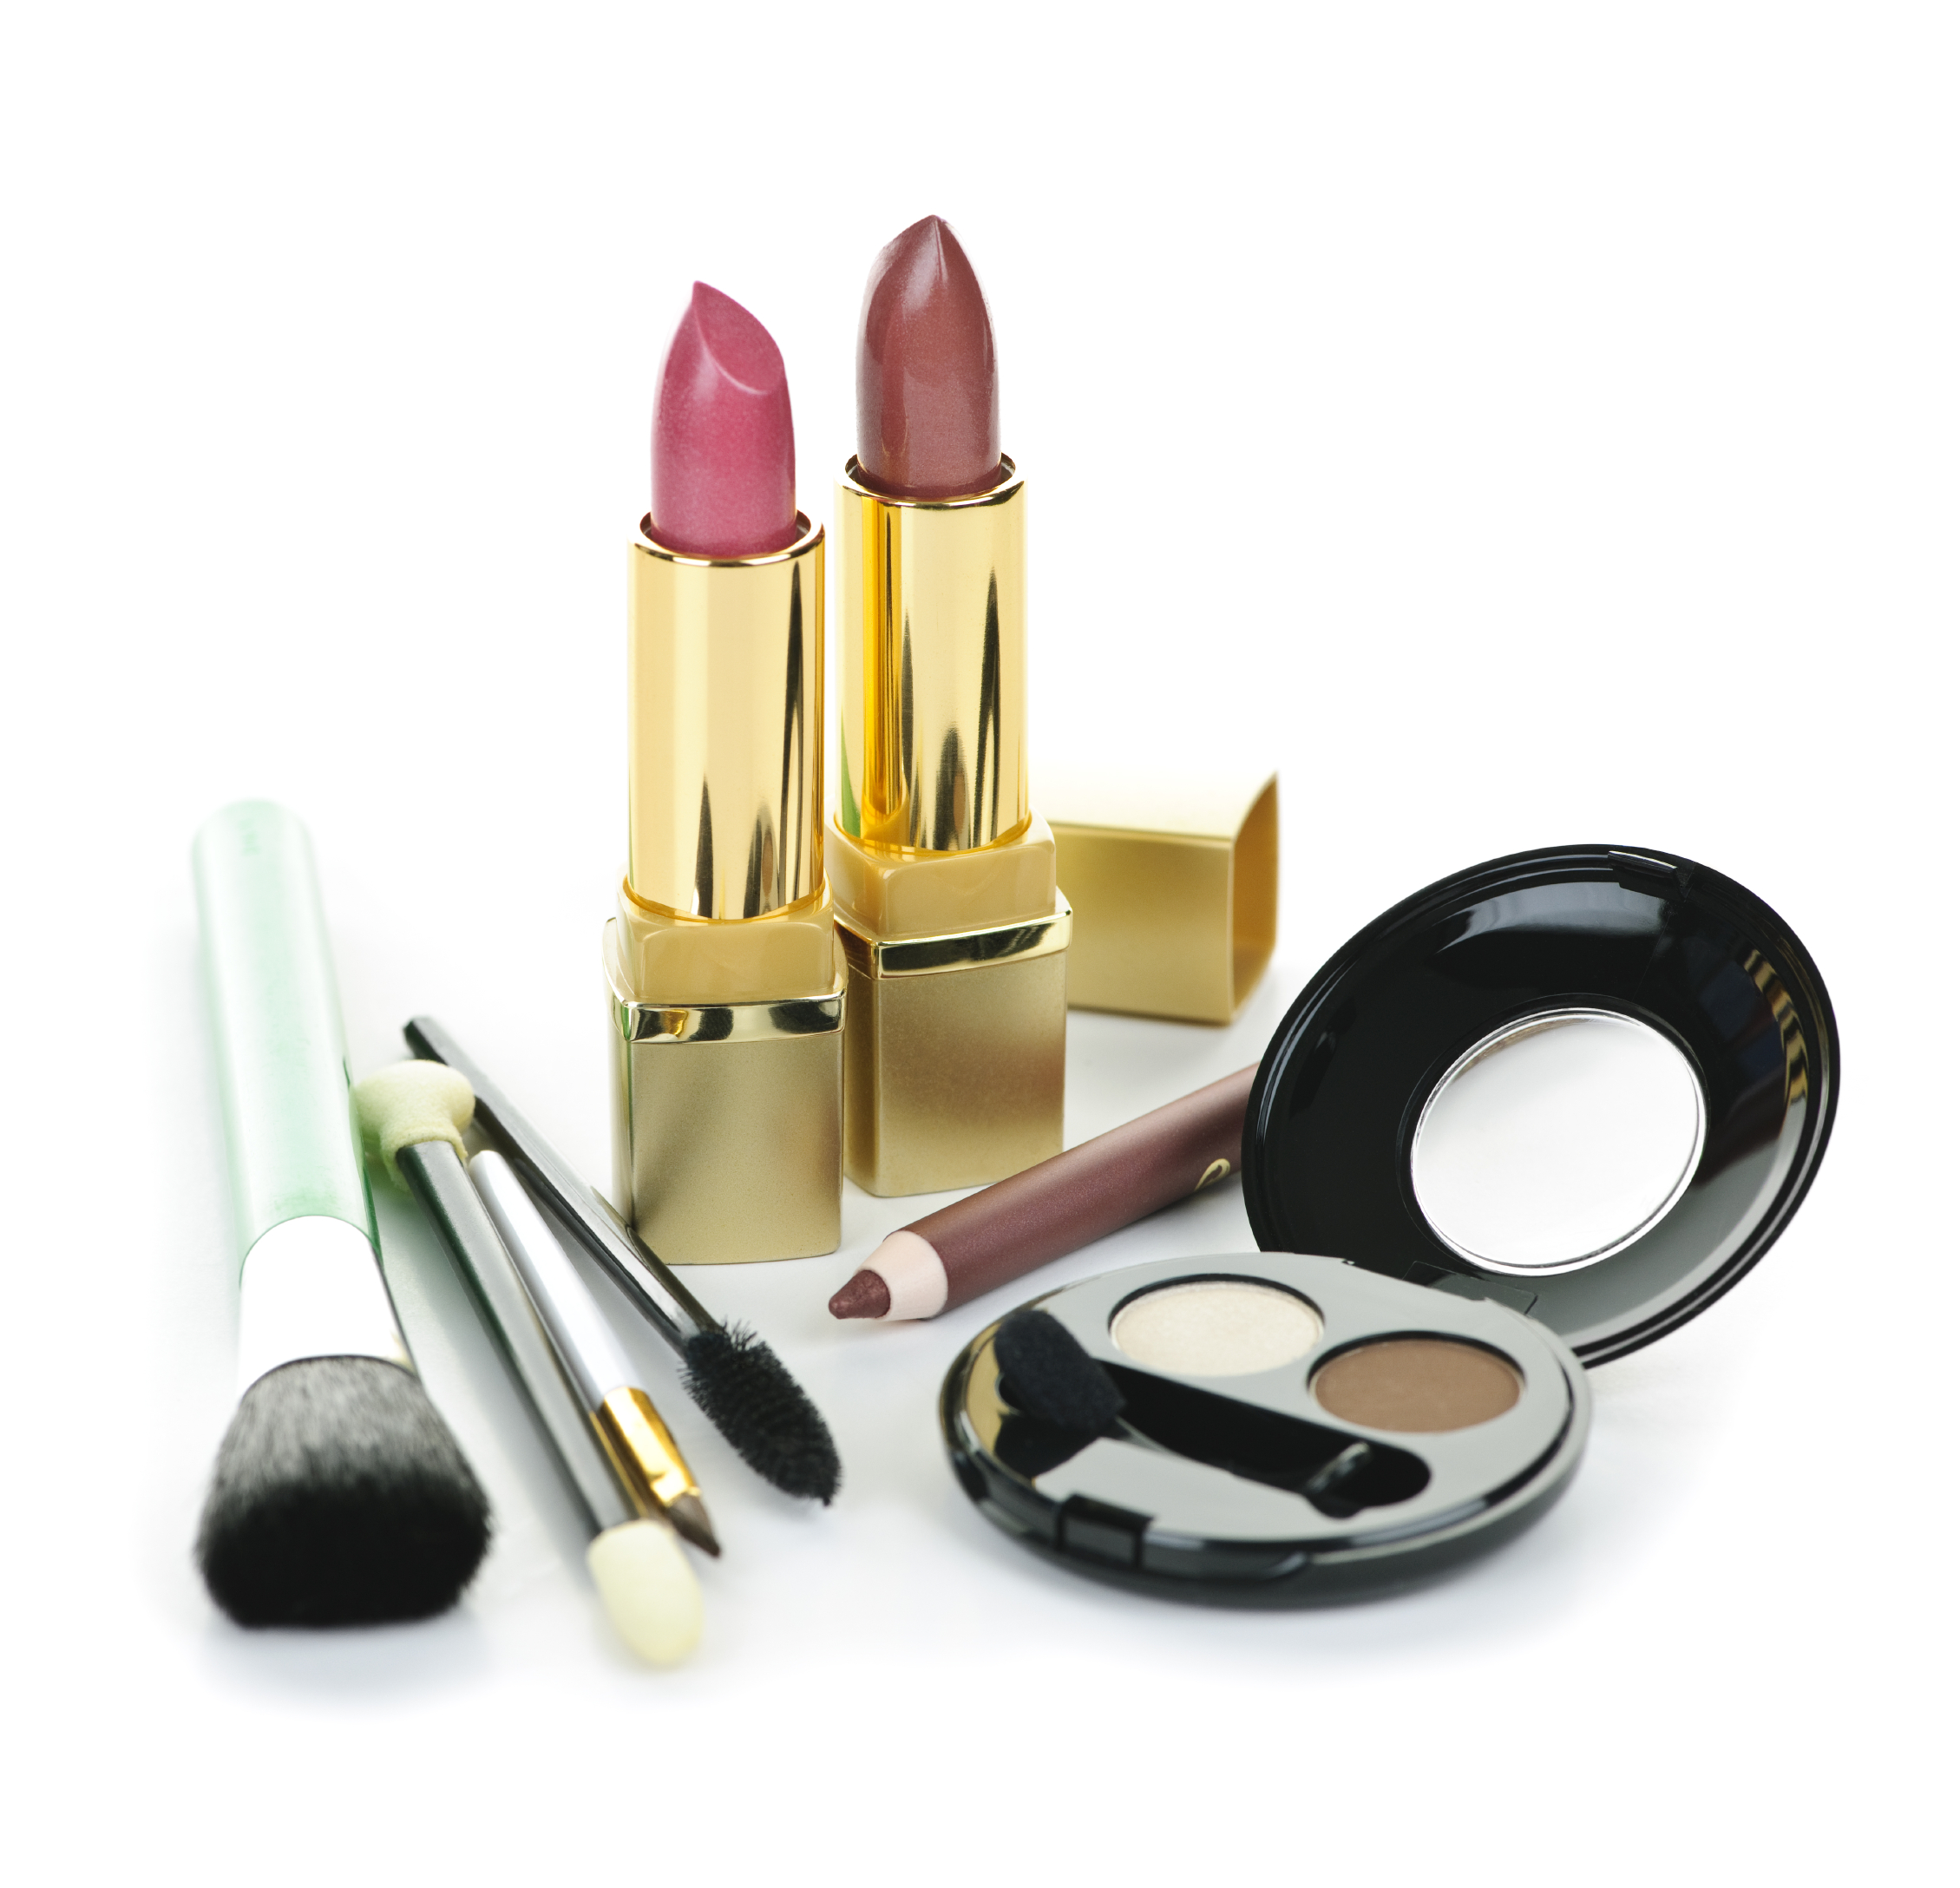 Makeup and cosmetics stock photo elena elisseeva (elenaphoto) (#2720186) stockfresh.